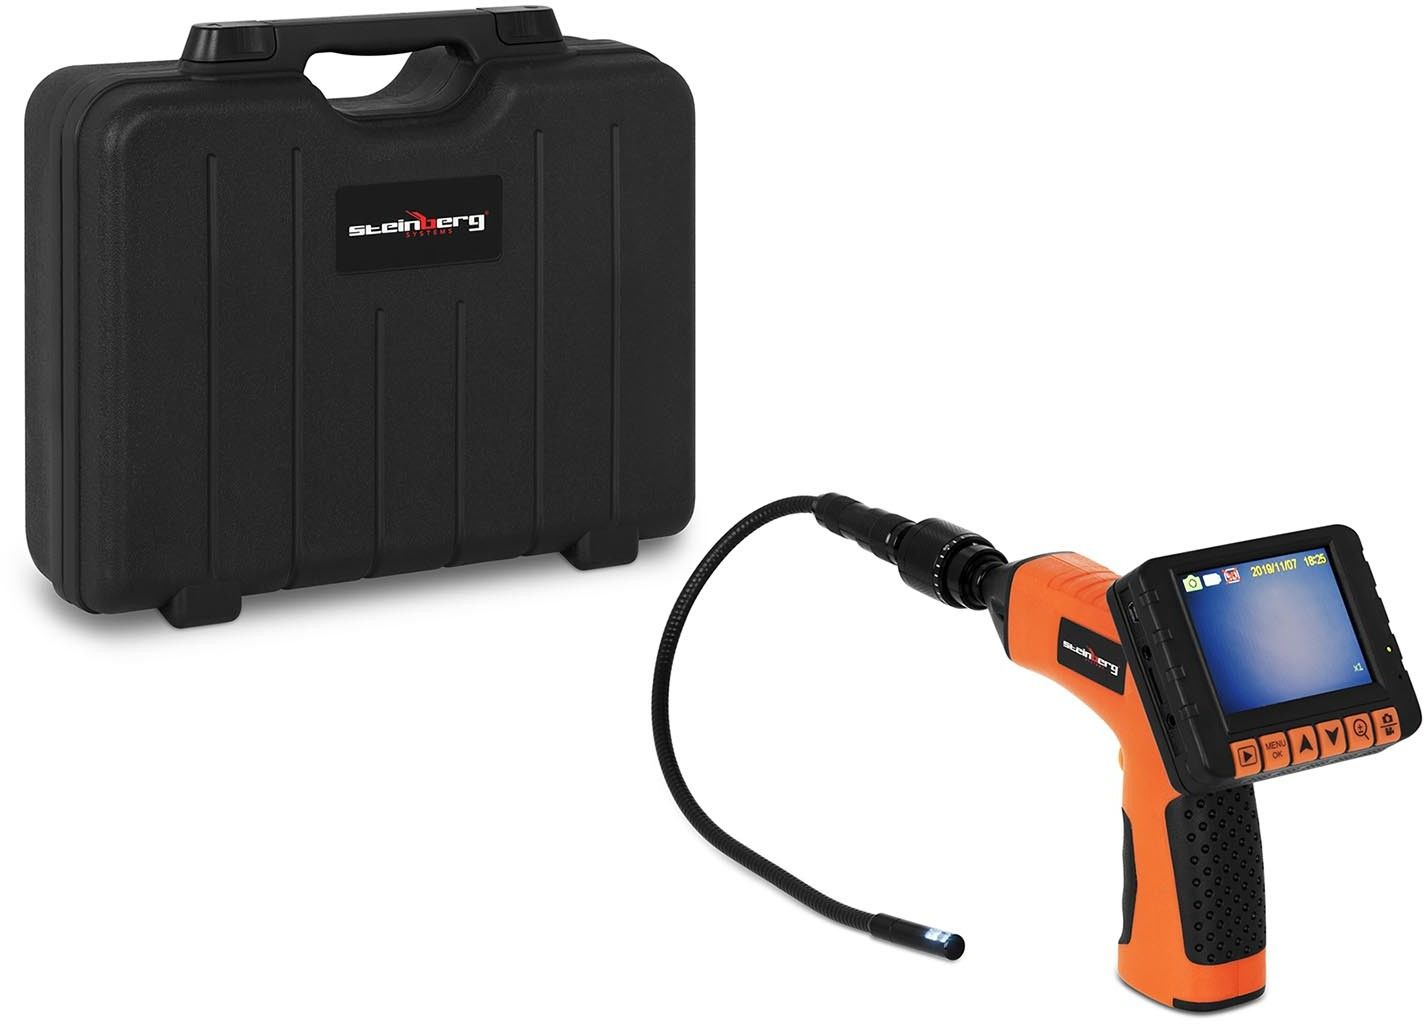 Kamera endoskopowa - 430 mm - 10 mm - Steinberg Systems - SBS-EC-10 - 3 lata gwarancji/wysyłka w 24h